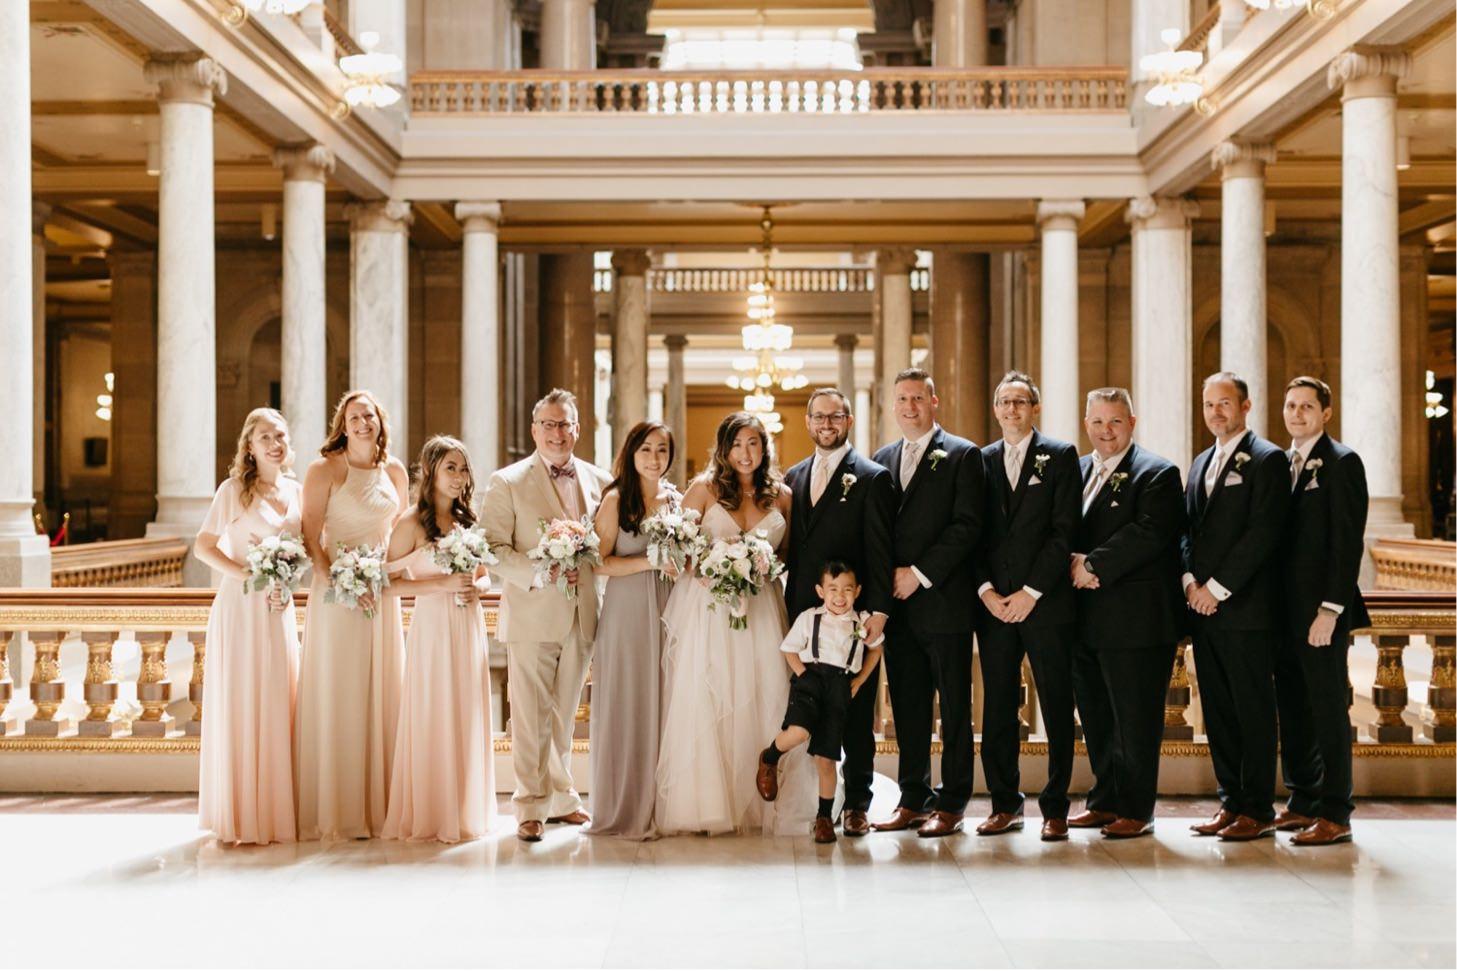 indiana-state-house-wedding-downtown-indianapolis-wedding-photographer068.JPG